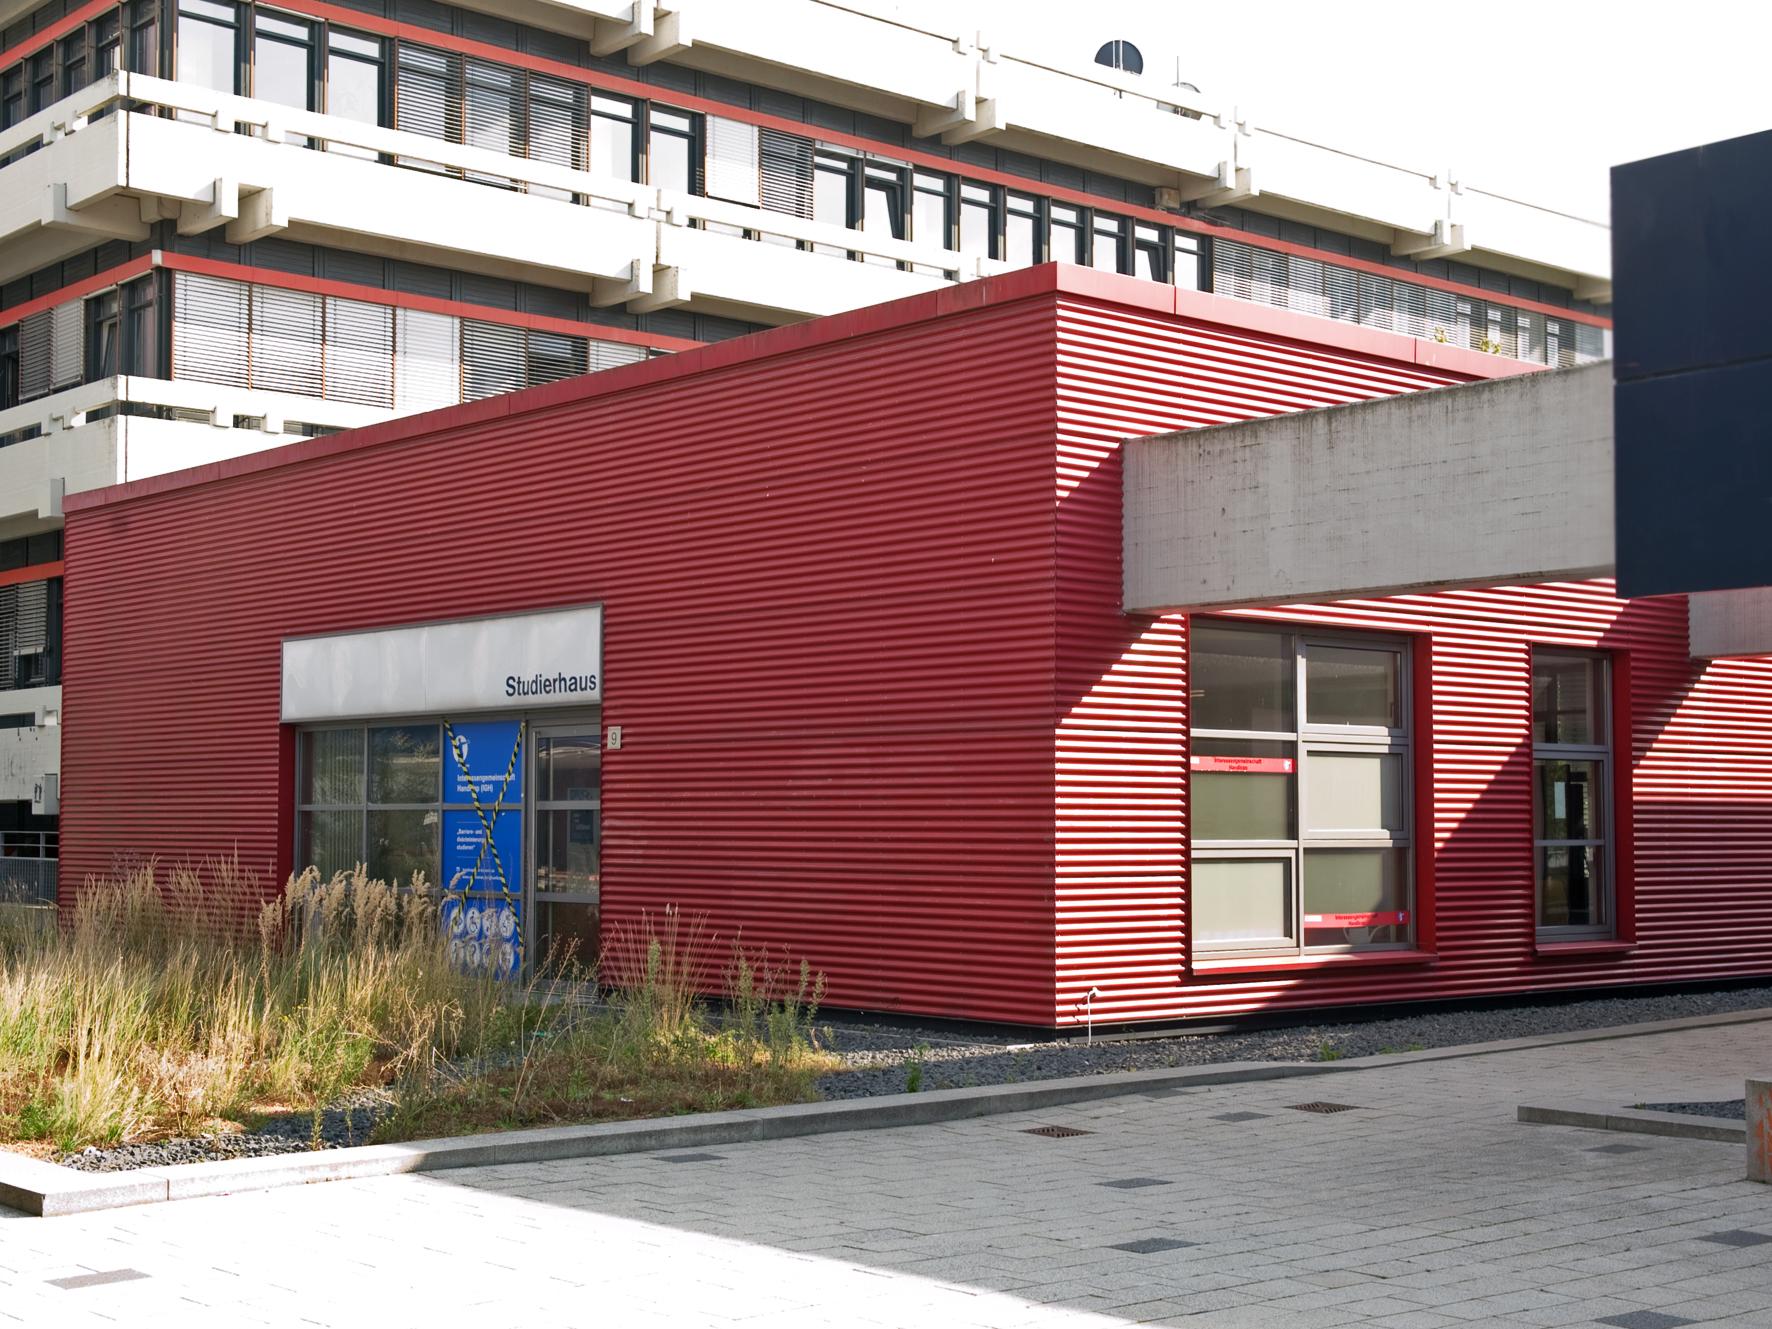 Studierhaus (Zentralbereich D, Boulevard)